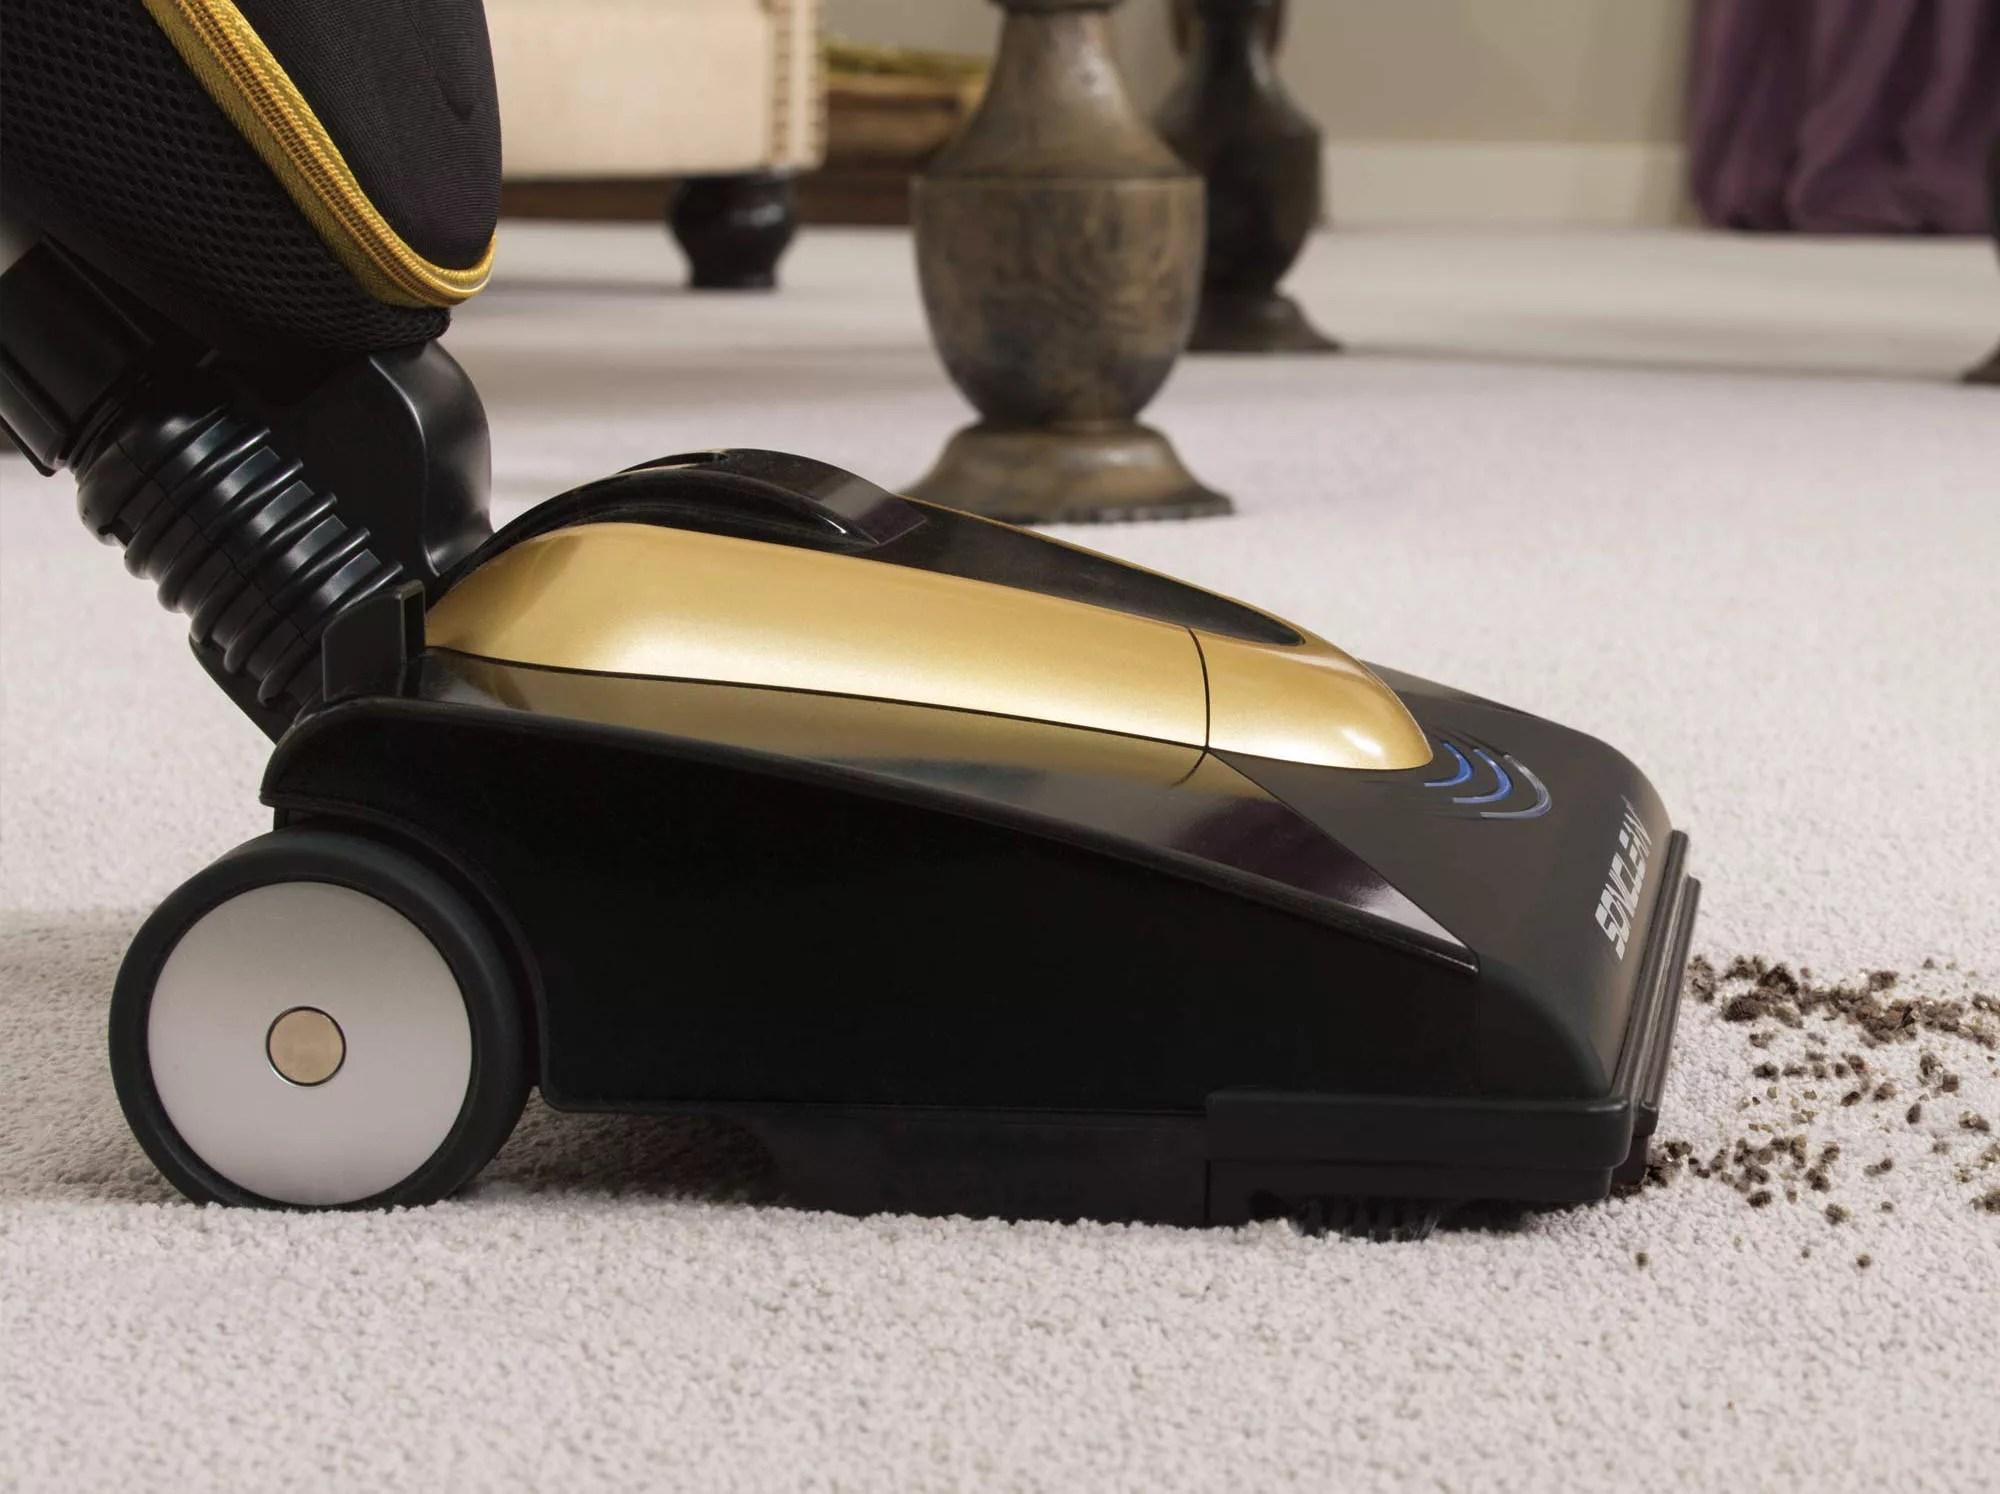 best vacuum for soft carpet - cleaning sensitive plush rugs